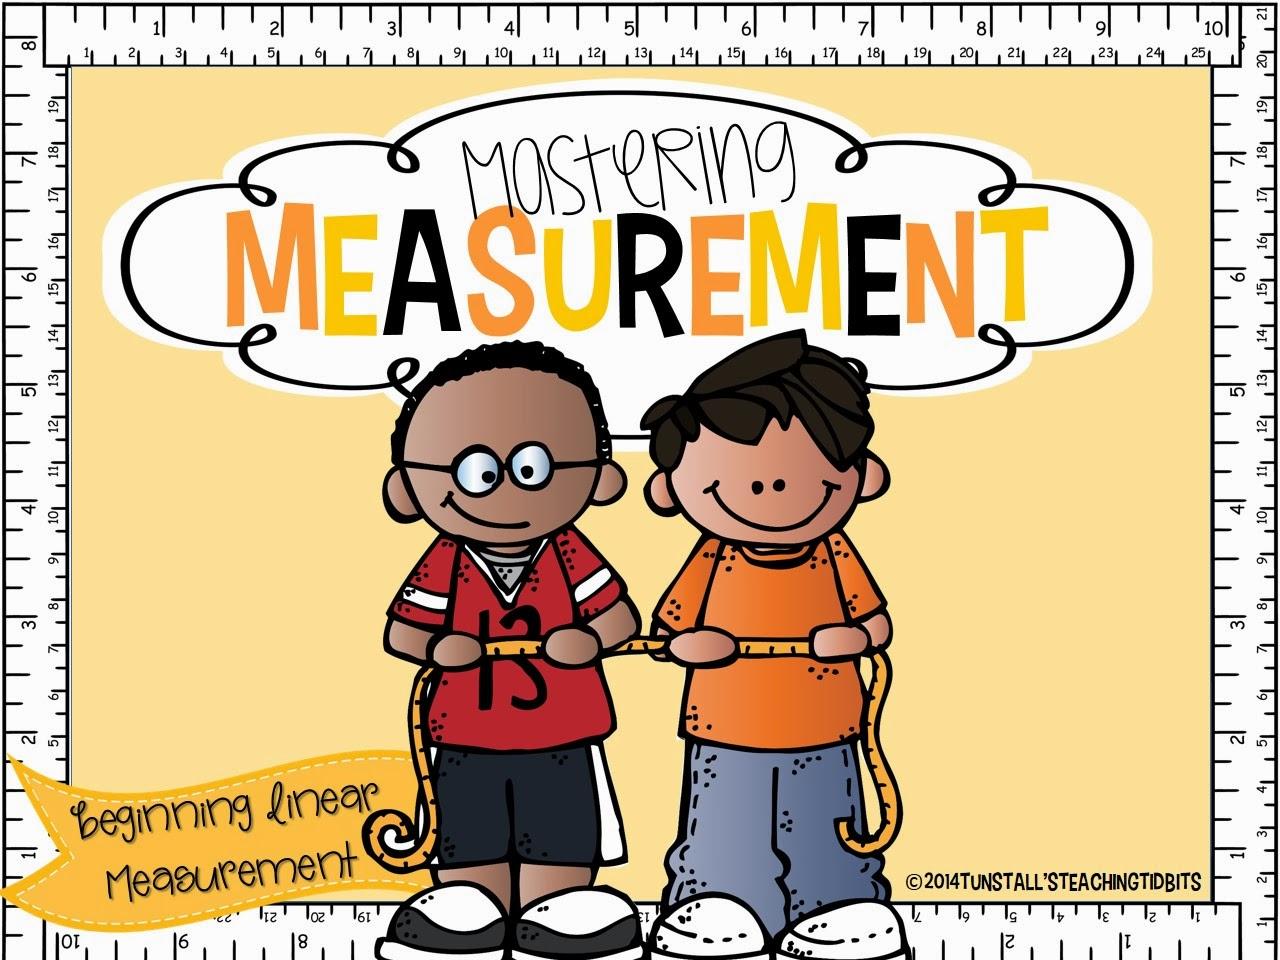 math worksheet : non standard measurement clipart  clipart kid : Non Standard Measurement Worksheets For Kindergarten